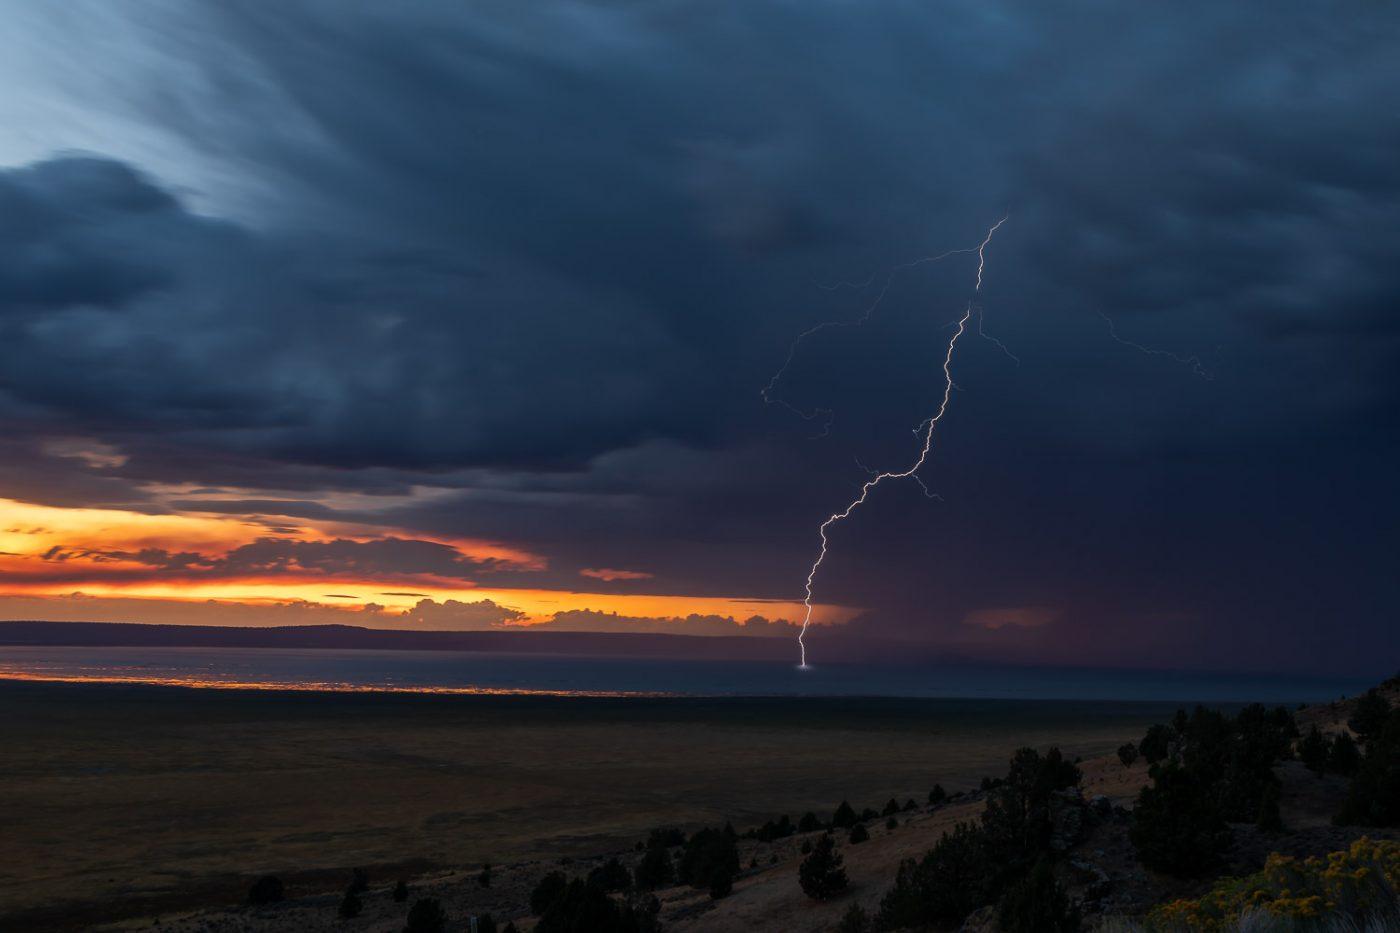 Lighting strikes Goose Lake, California with dark clouds and an orange sunset.